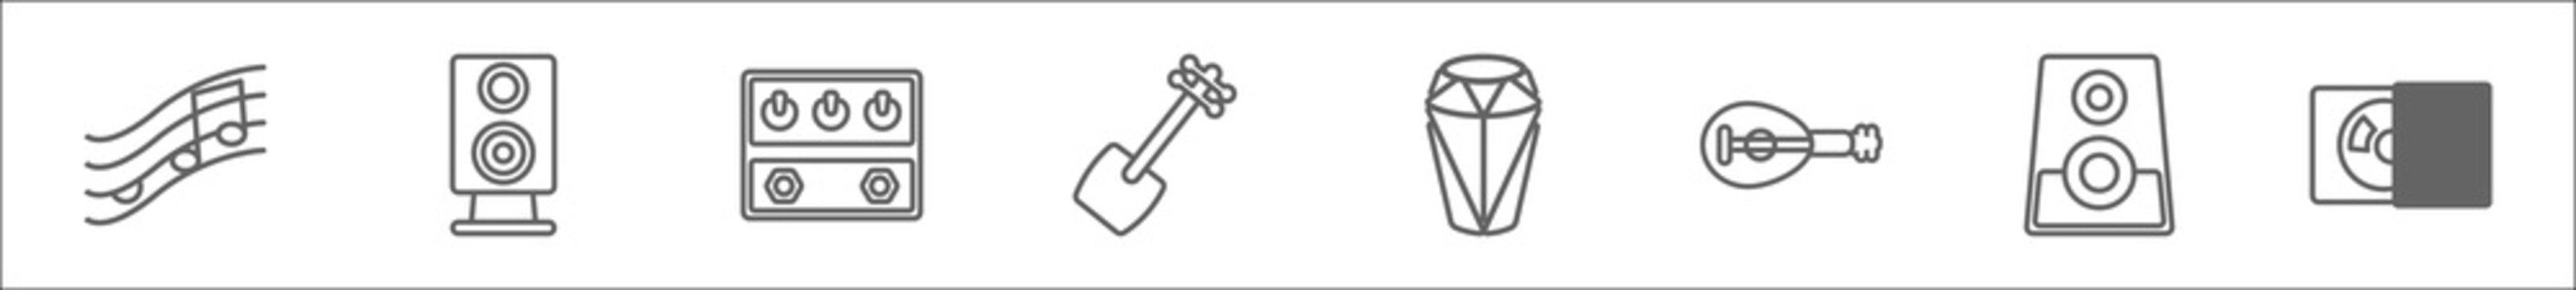 outline set of music line icons. linear vector icons such as pentagram, vintage loudspeaker, guitar pedal, shamisen, old drum, lute, subwoofer speaker, cd writer